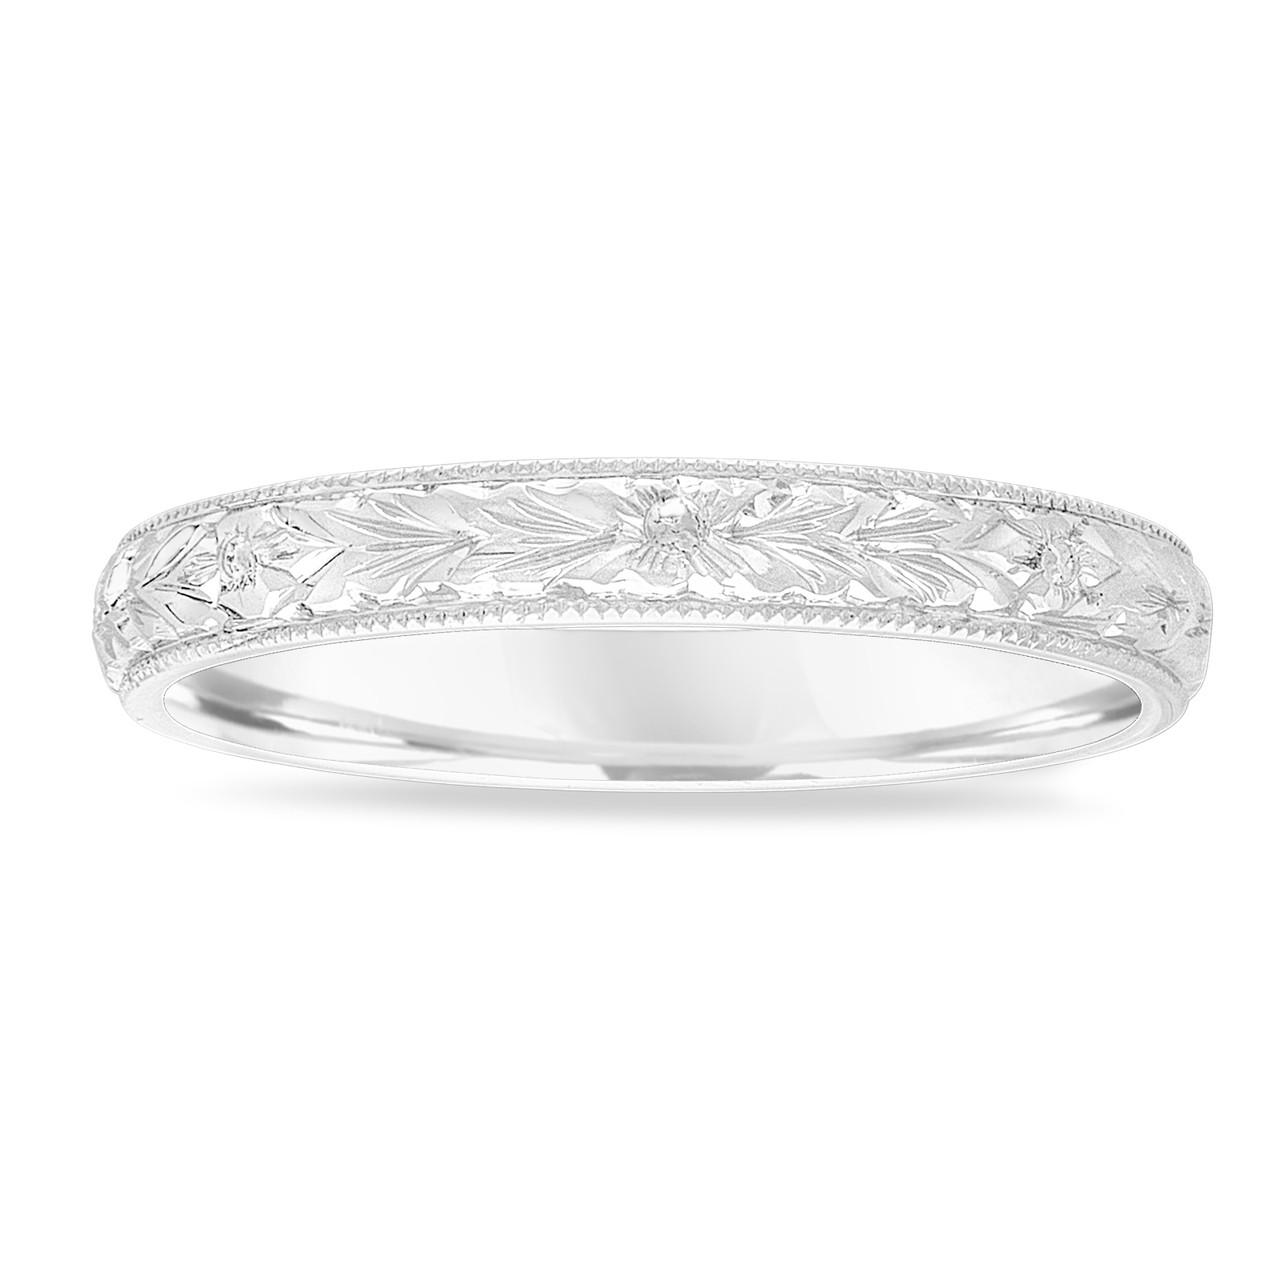 Platinum Vintage Wedding Band, Hand Engraved Wedding Ring